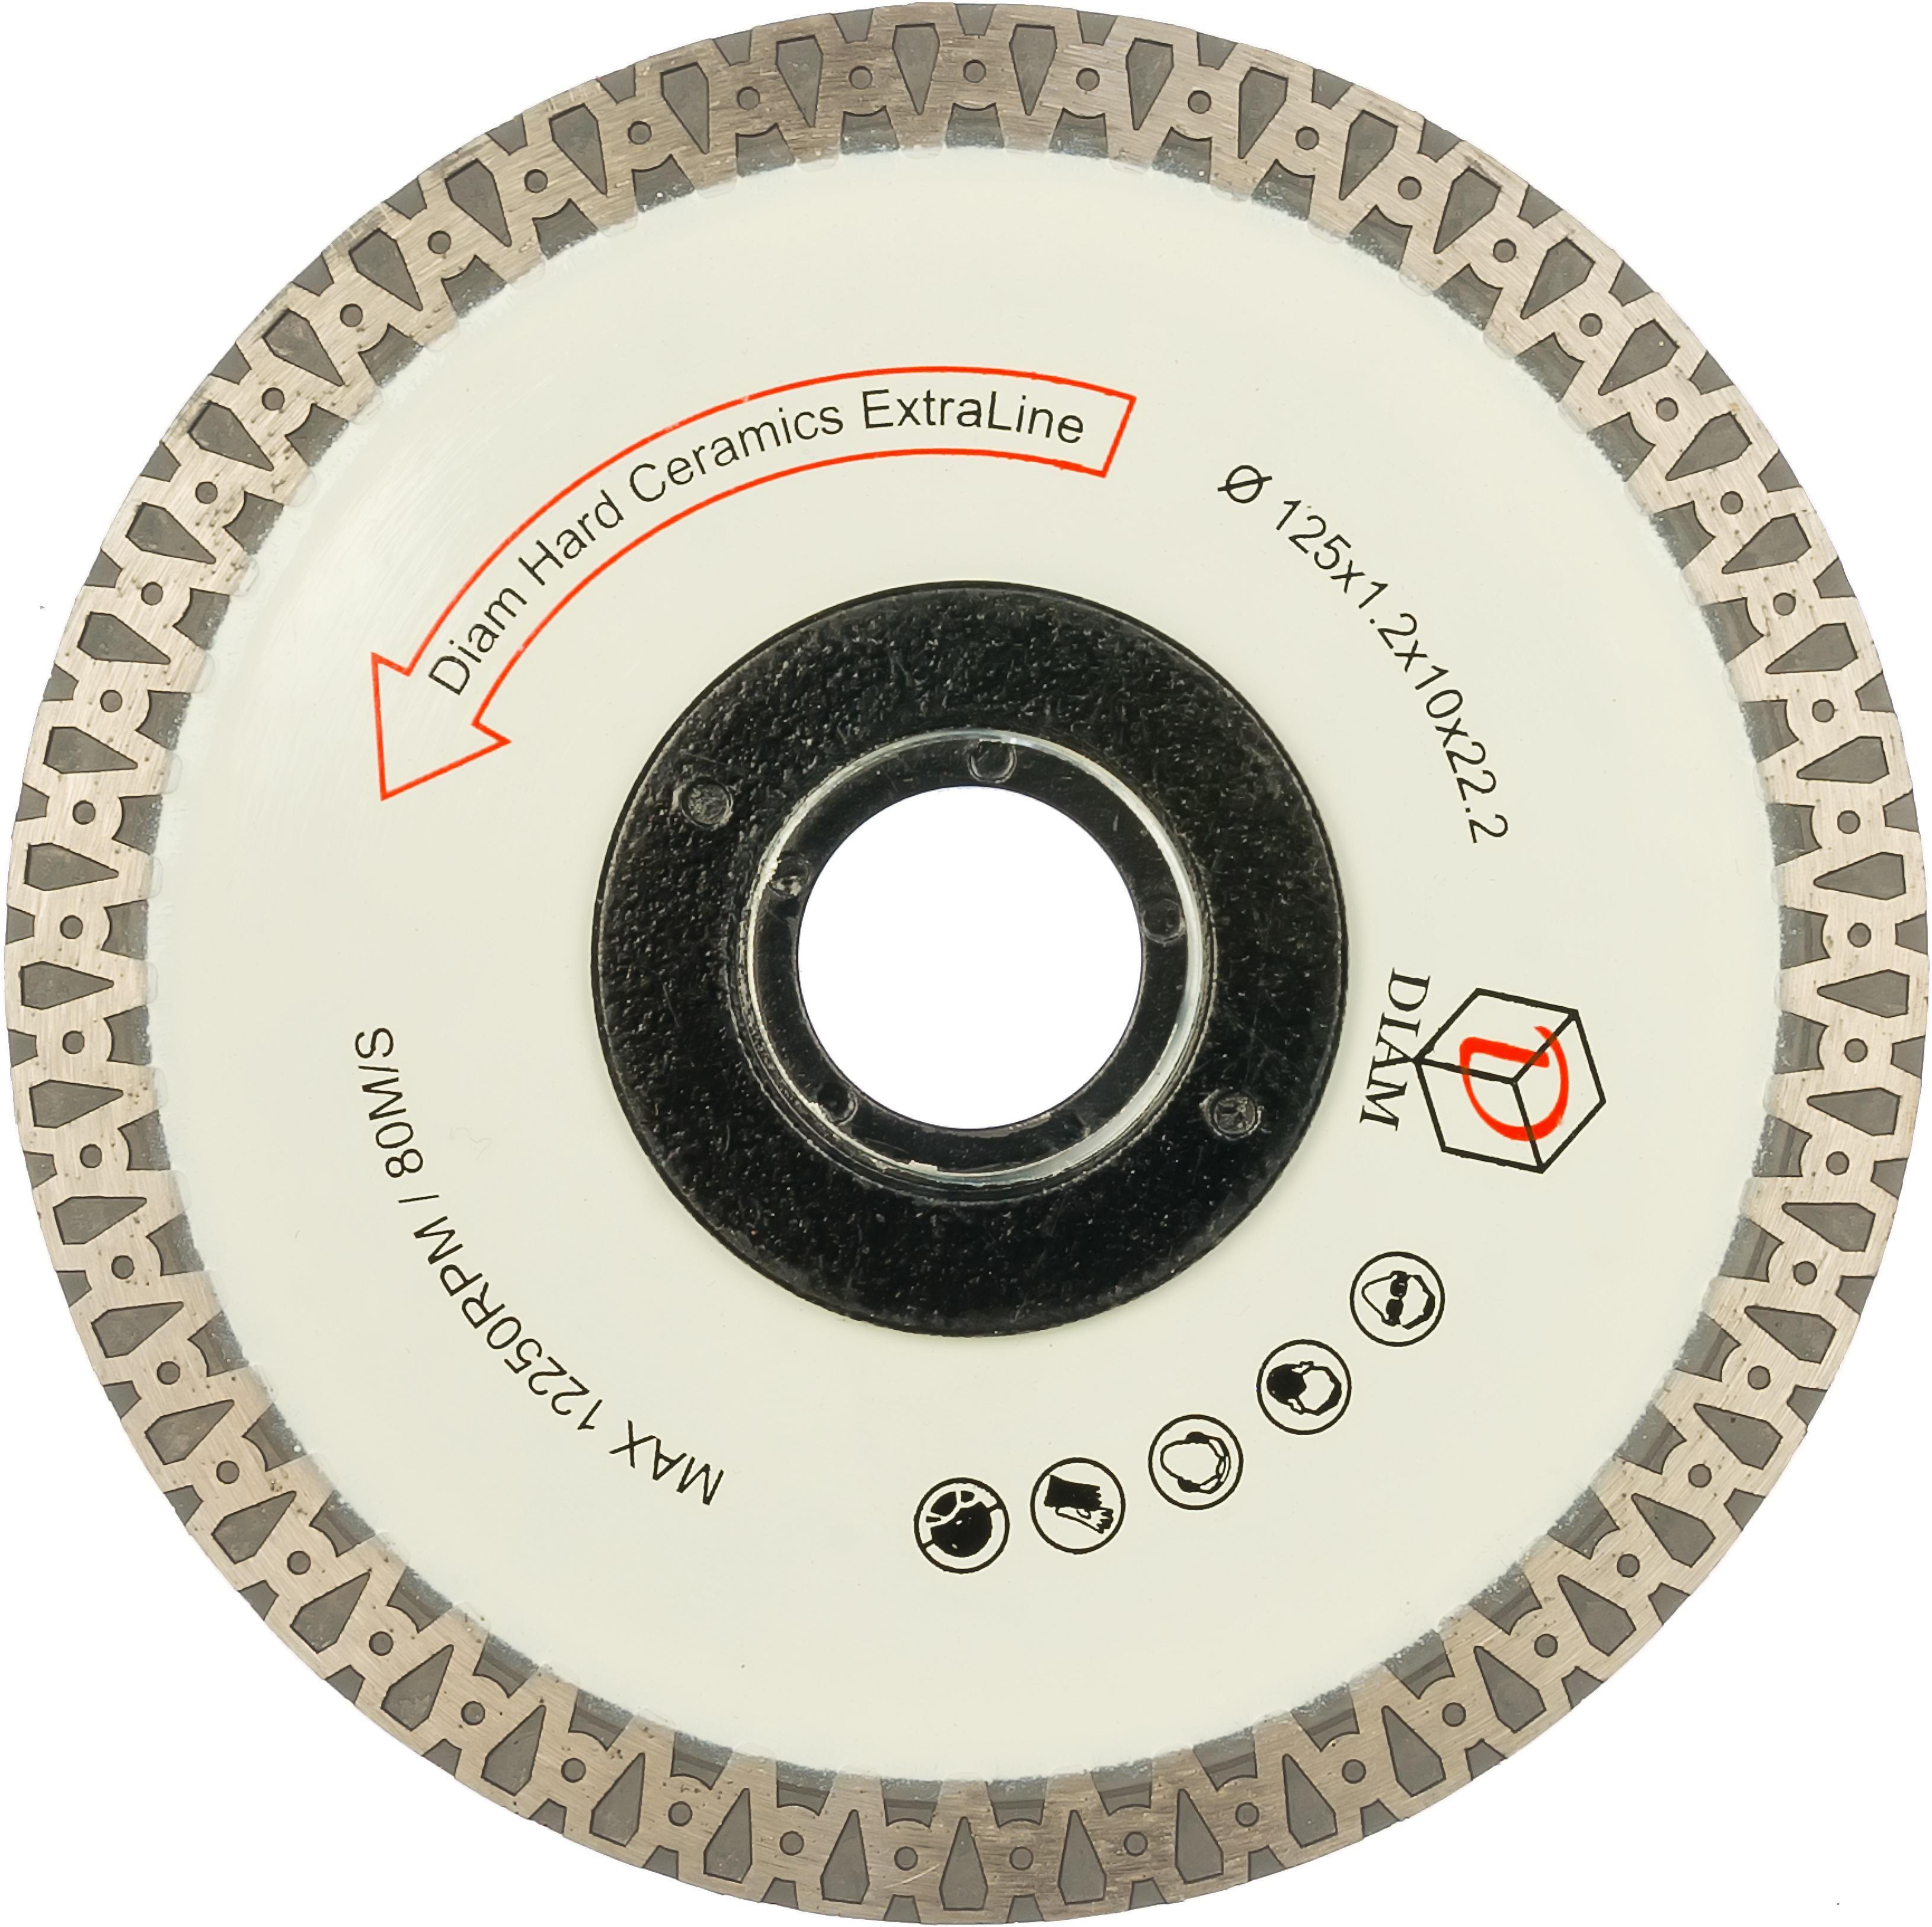 Круг алмазный Diam Ф125x22мм hard ceramics extra line 1.2x10мм цены